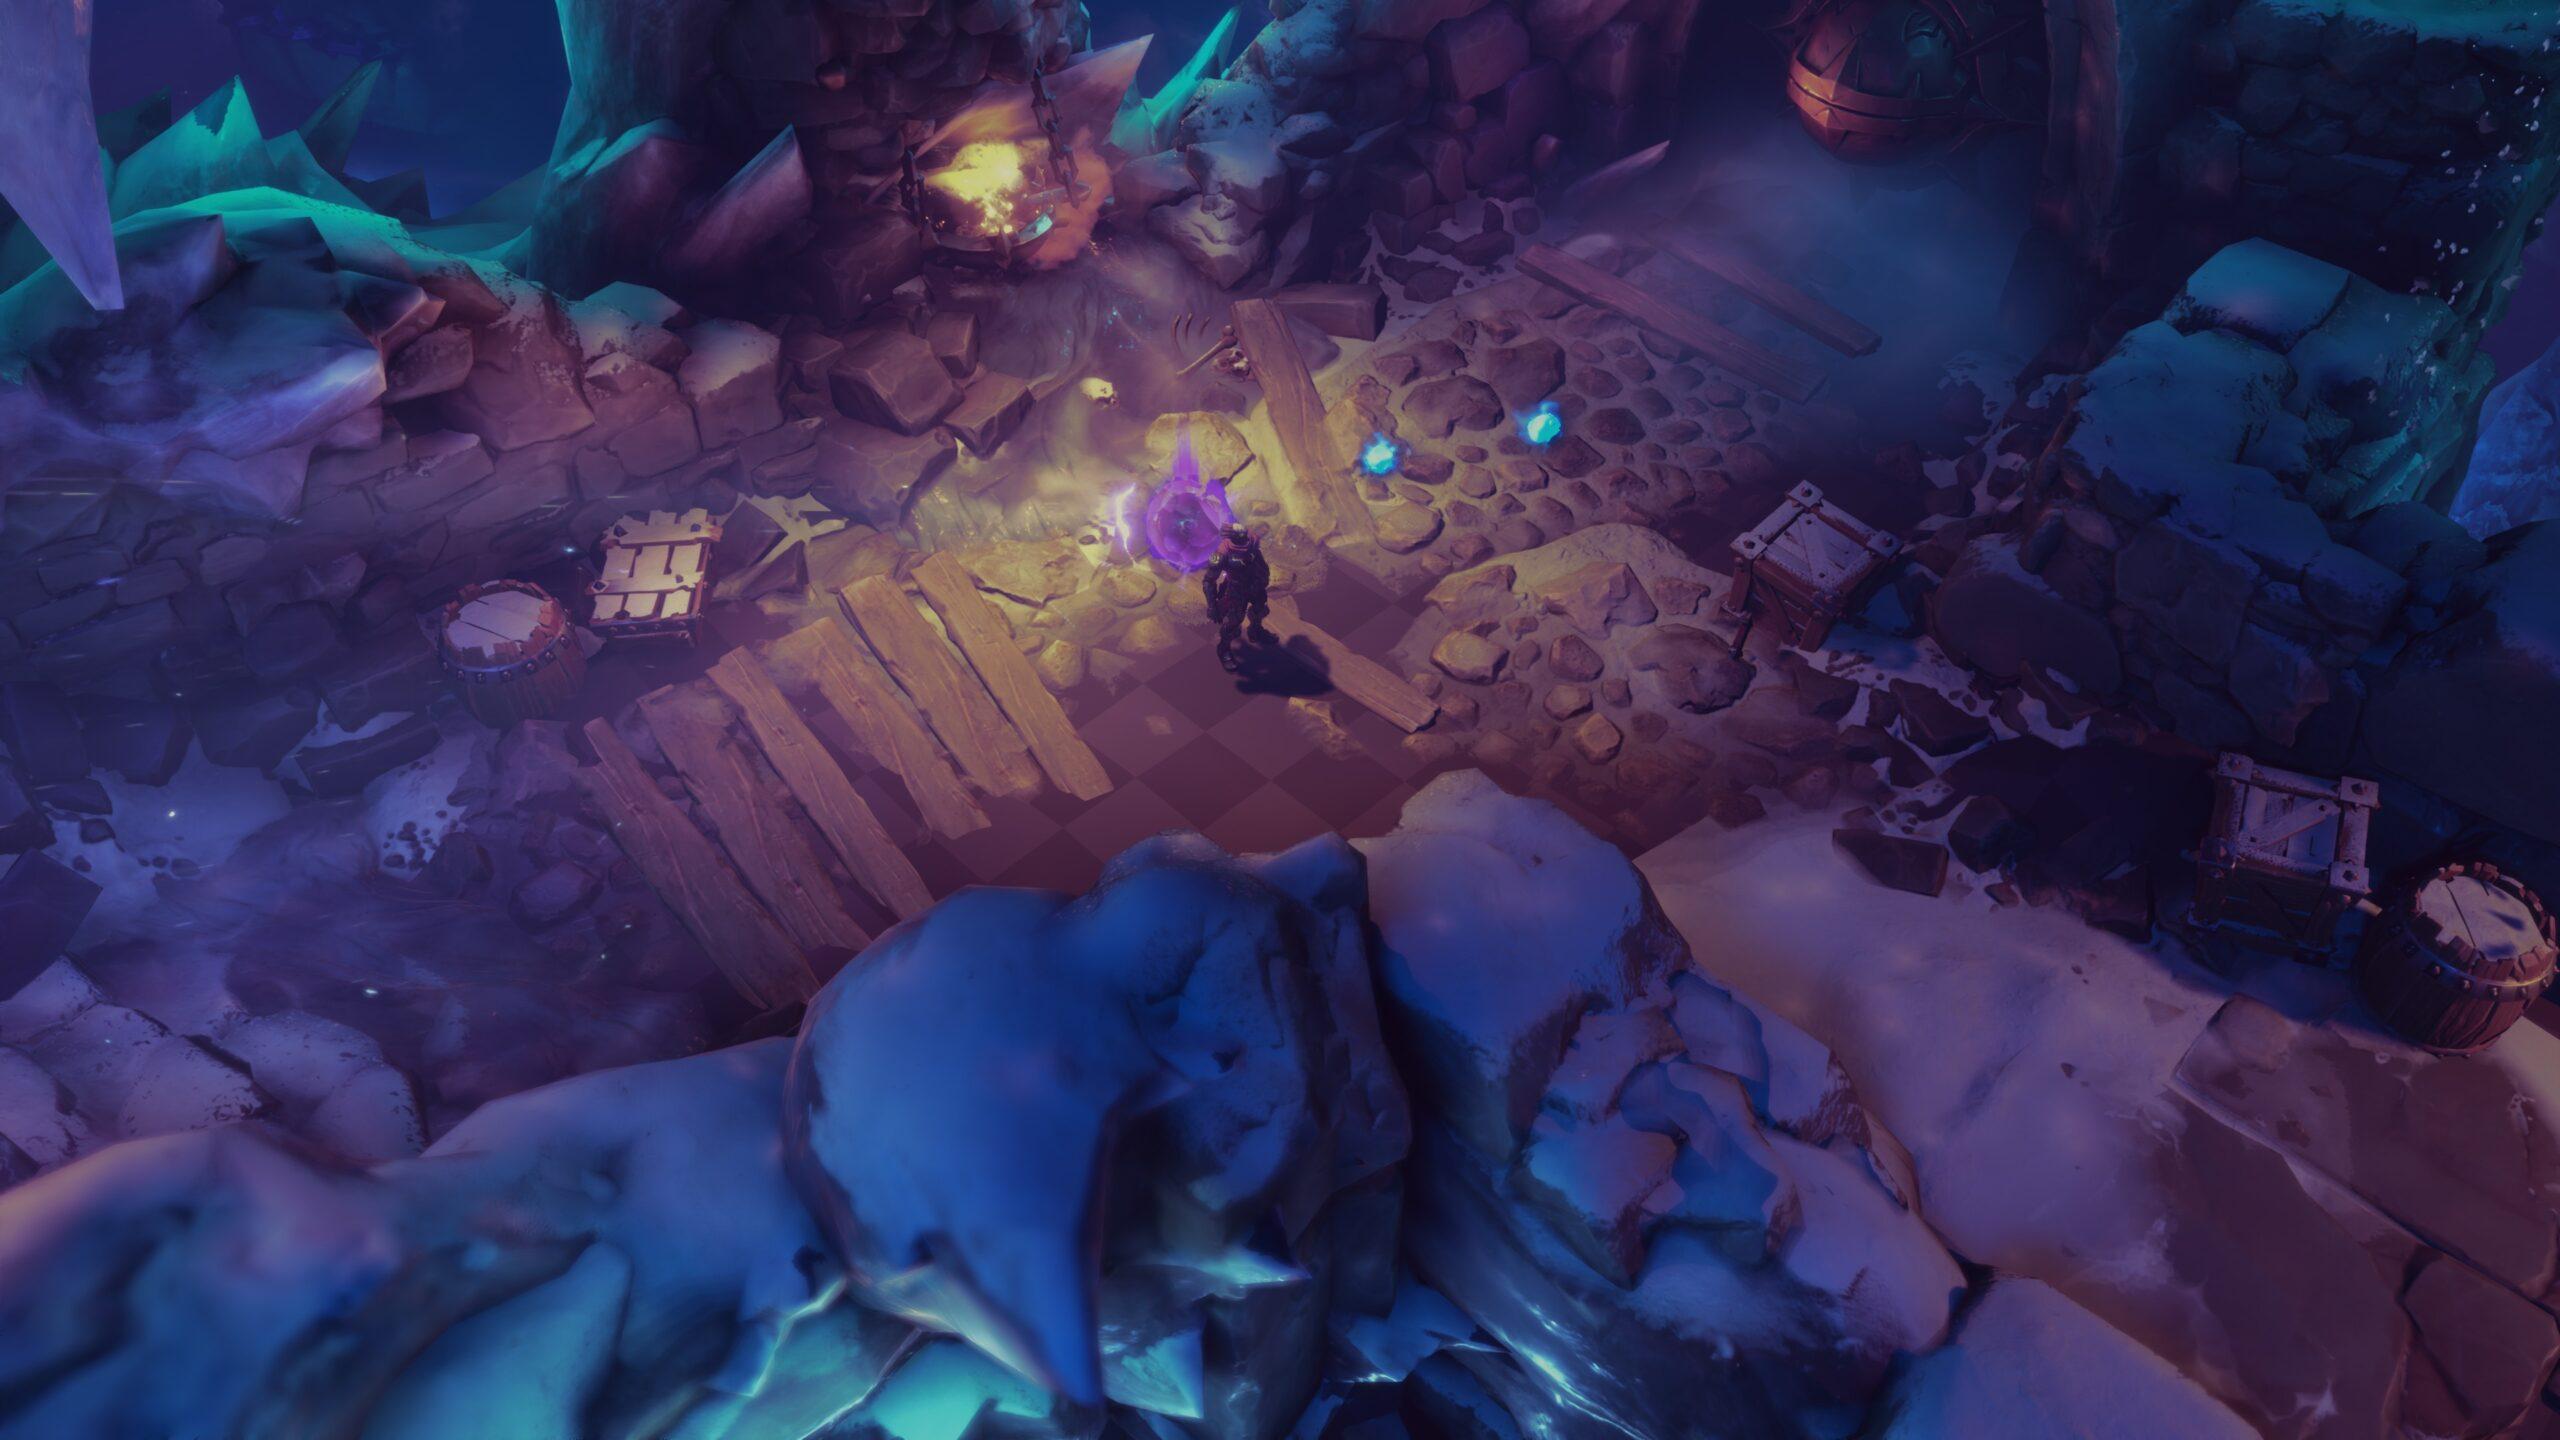 Darksiders Genesis Game Review Illustrates Maximum Co-op Features